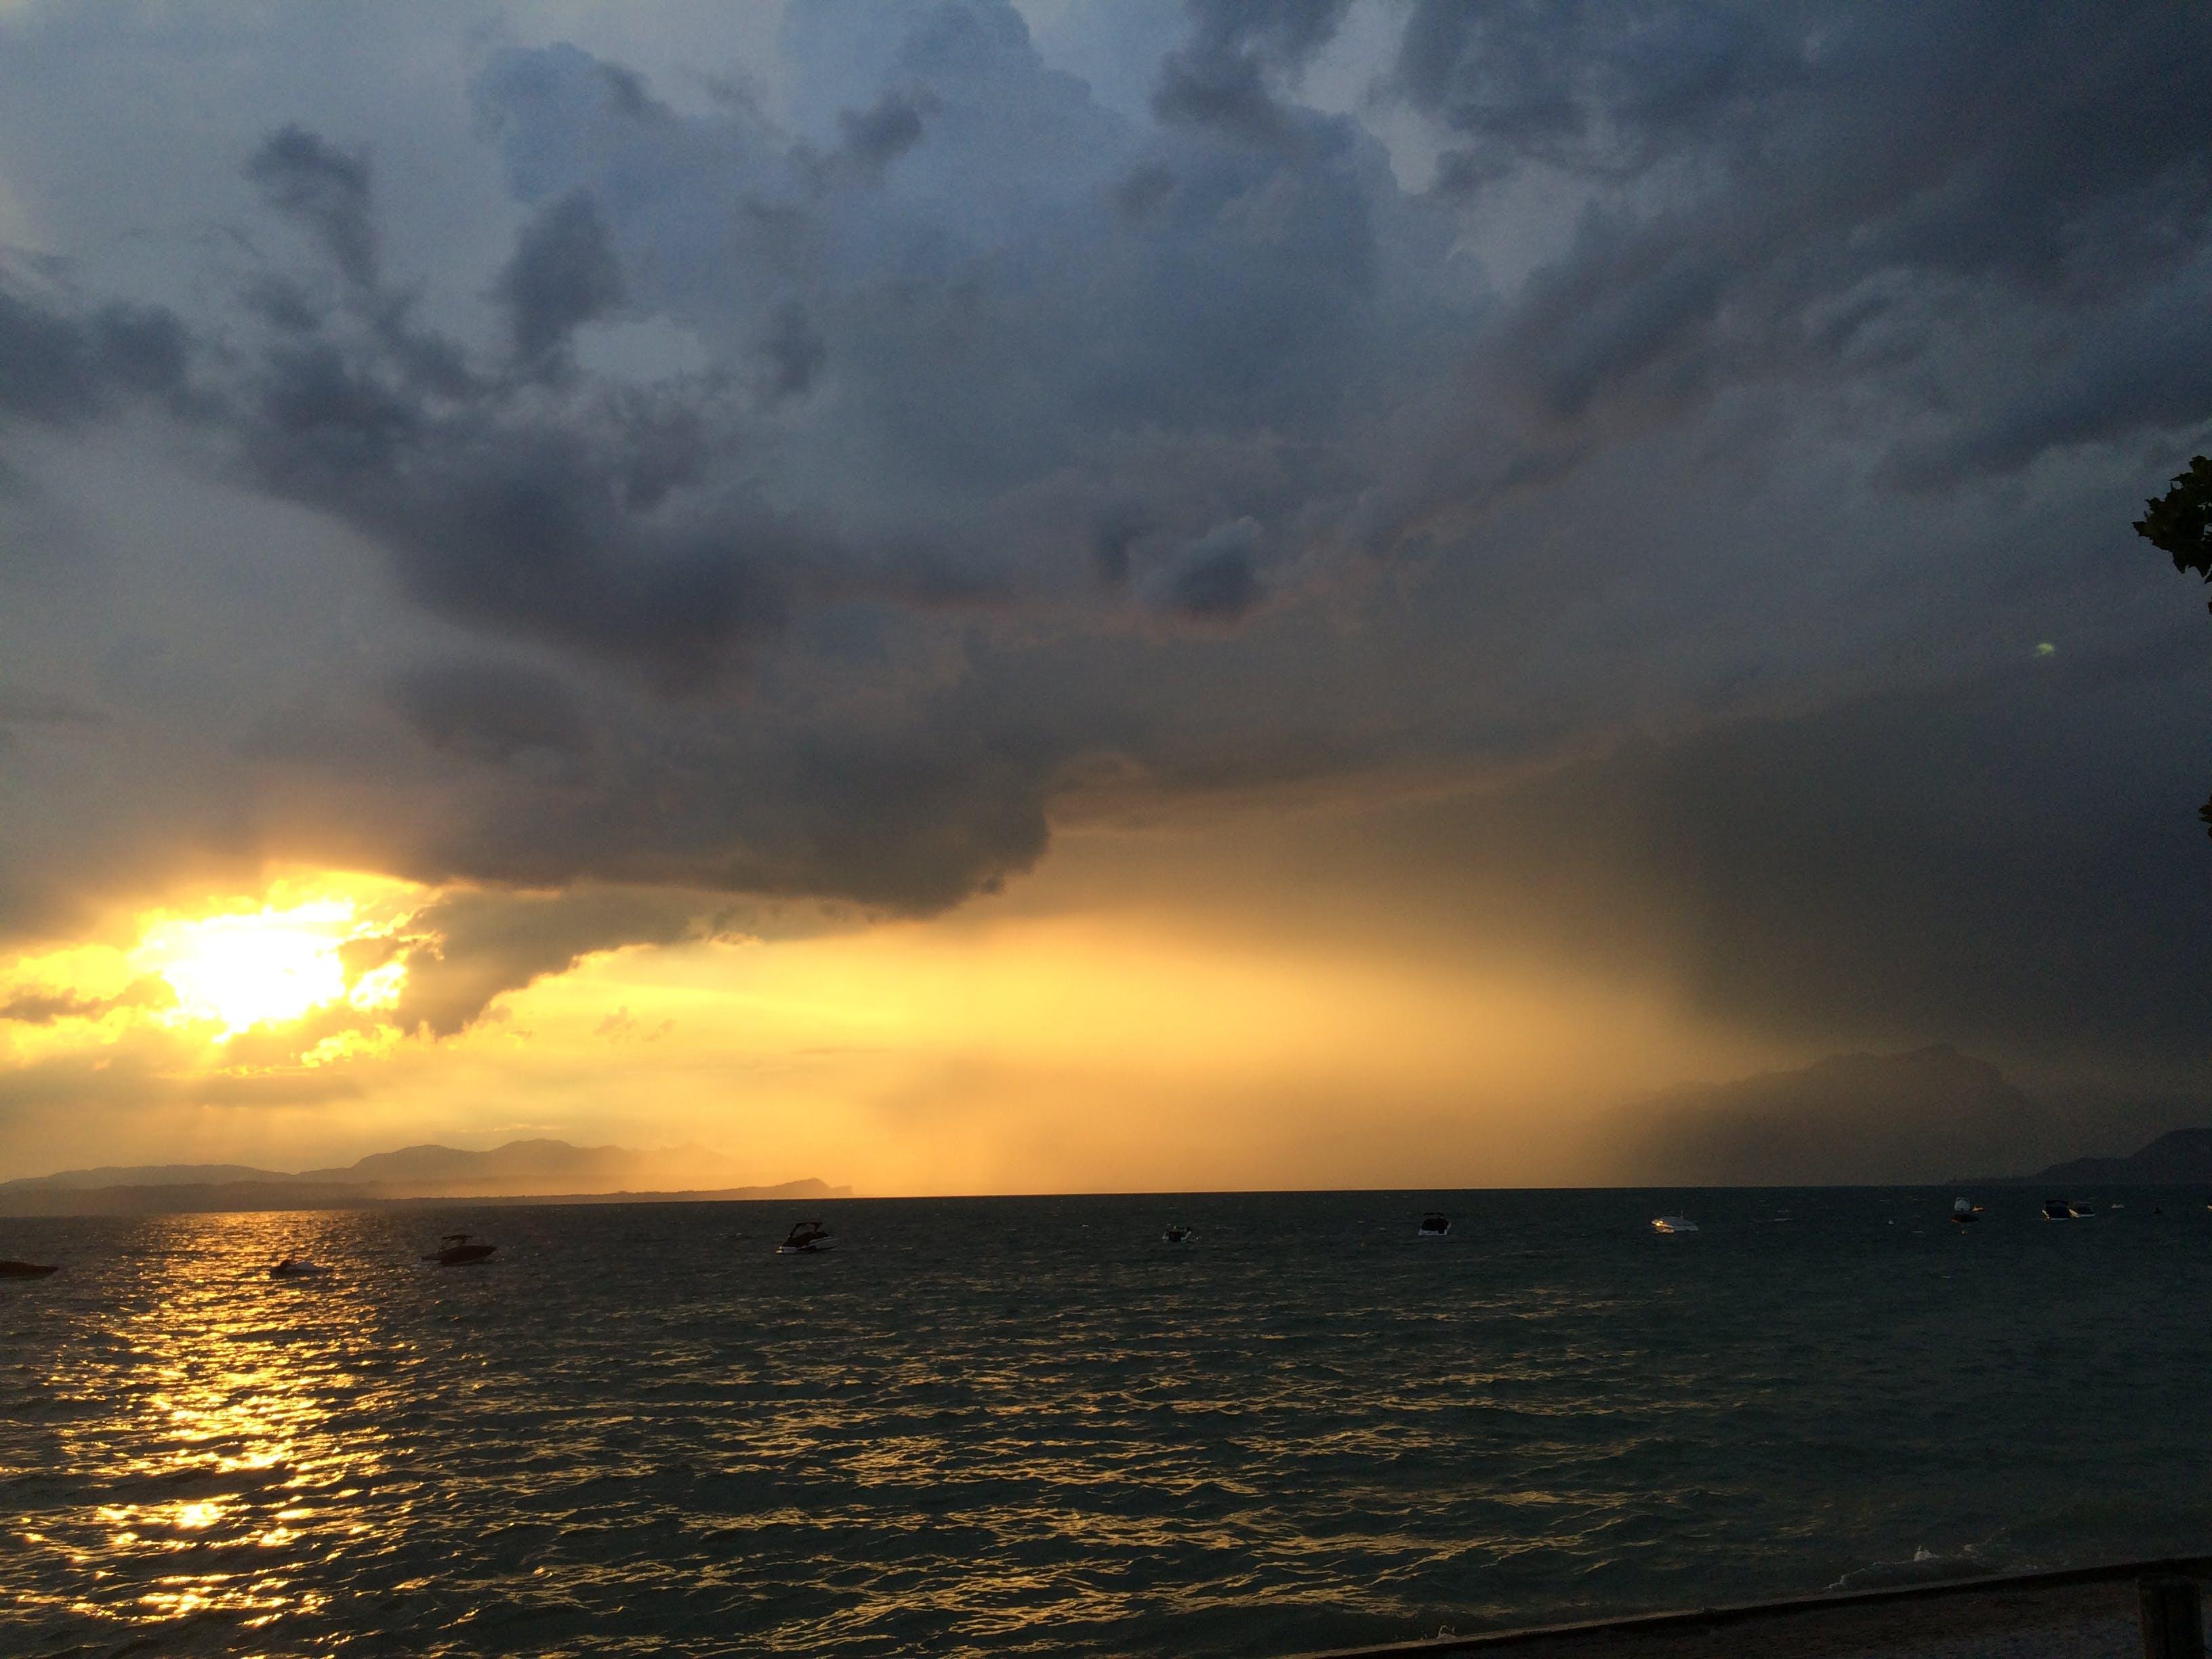 Free stock photo of clouds, italy, thunder, lake garda